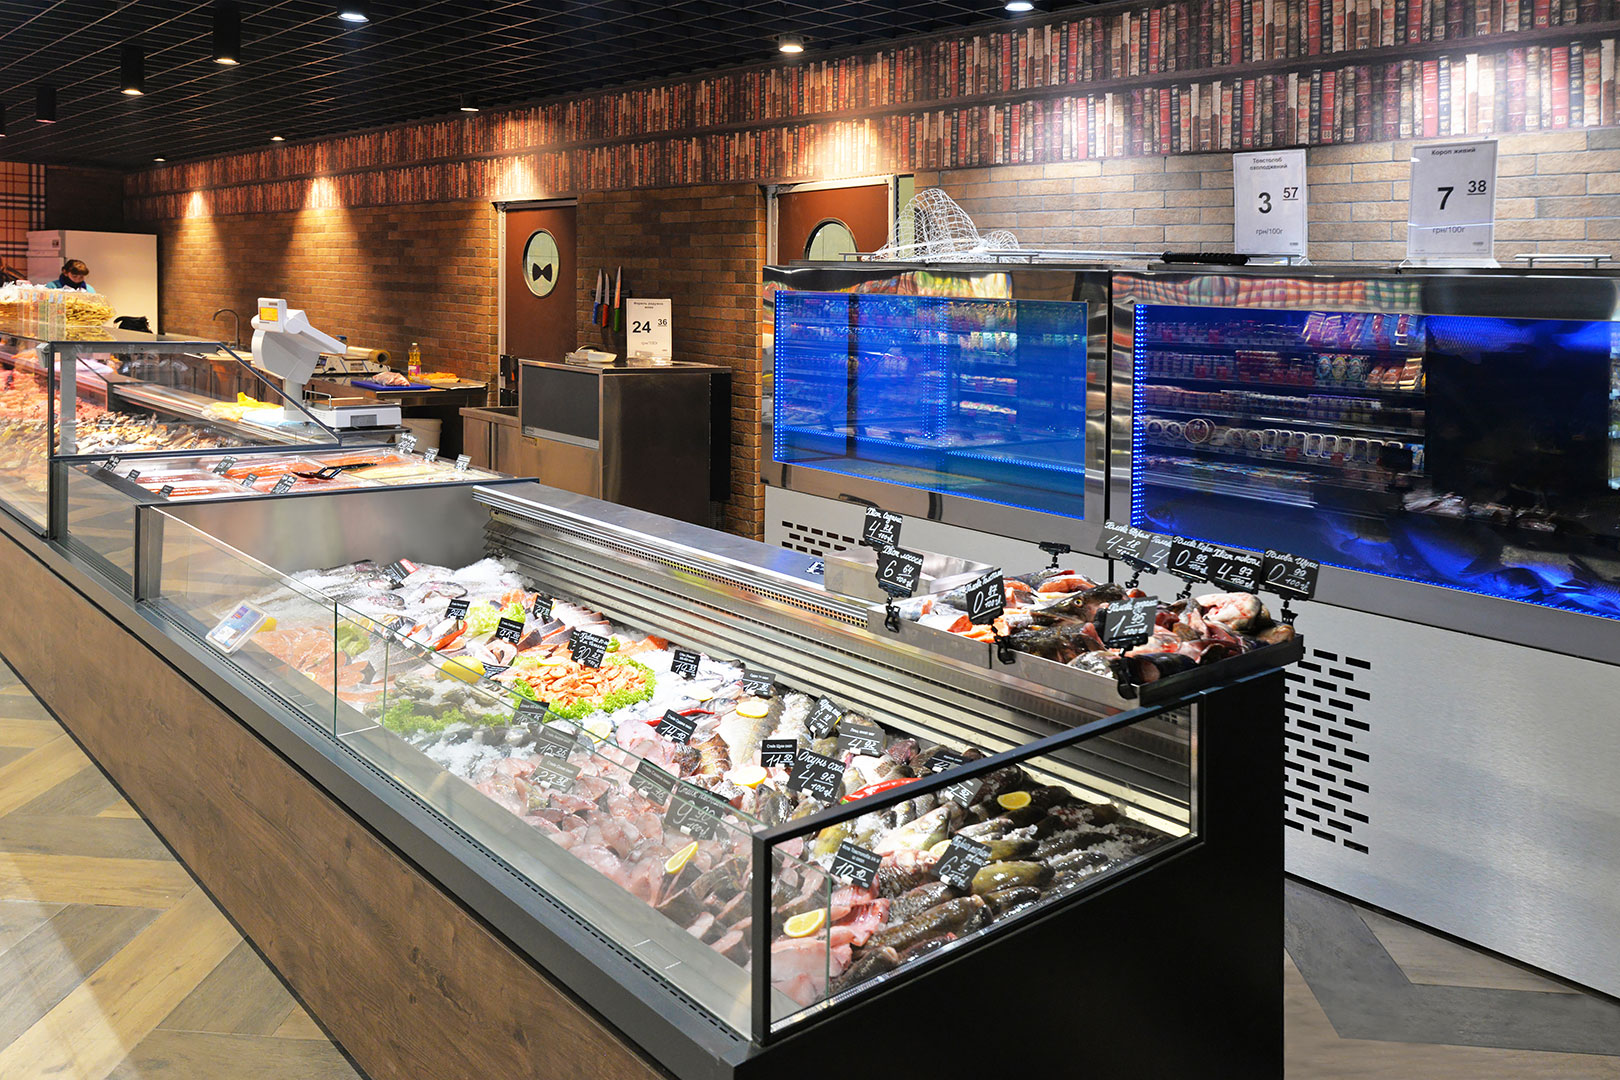 Specialized counters for fish and seafood sales Missouri MC 120 fish self 086-SLA, Missouri MC 120 ice self 086-SLM